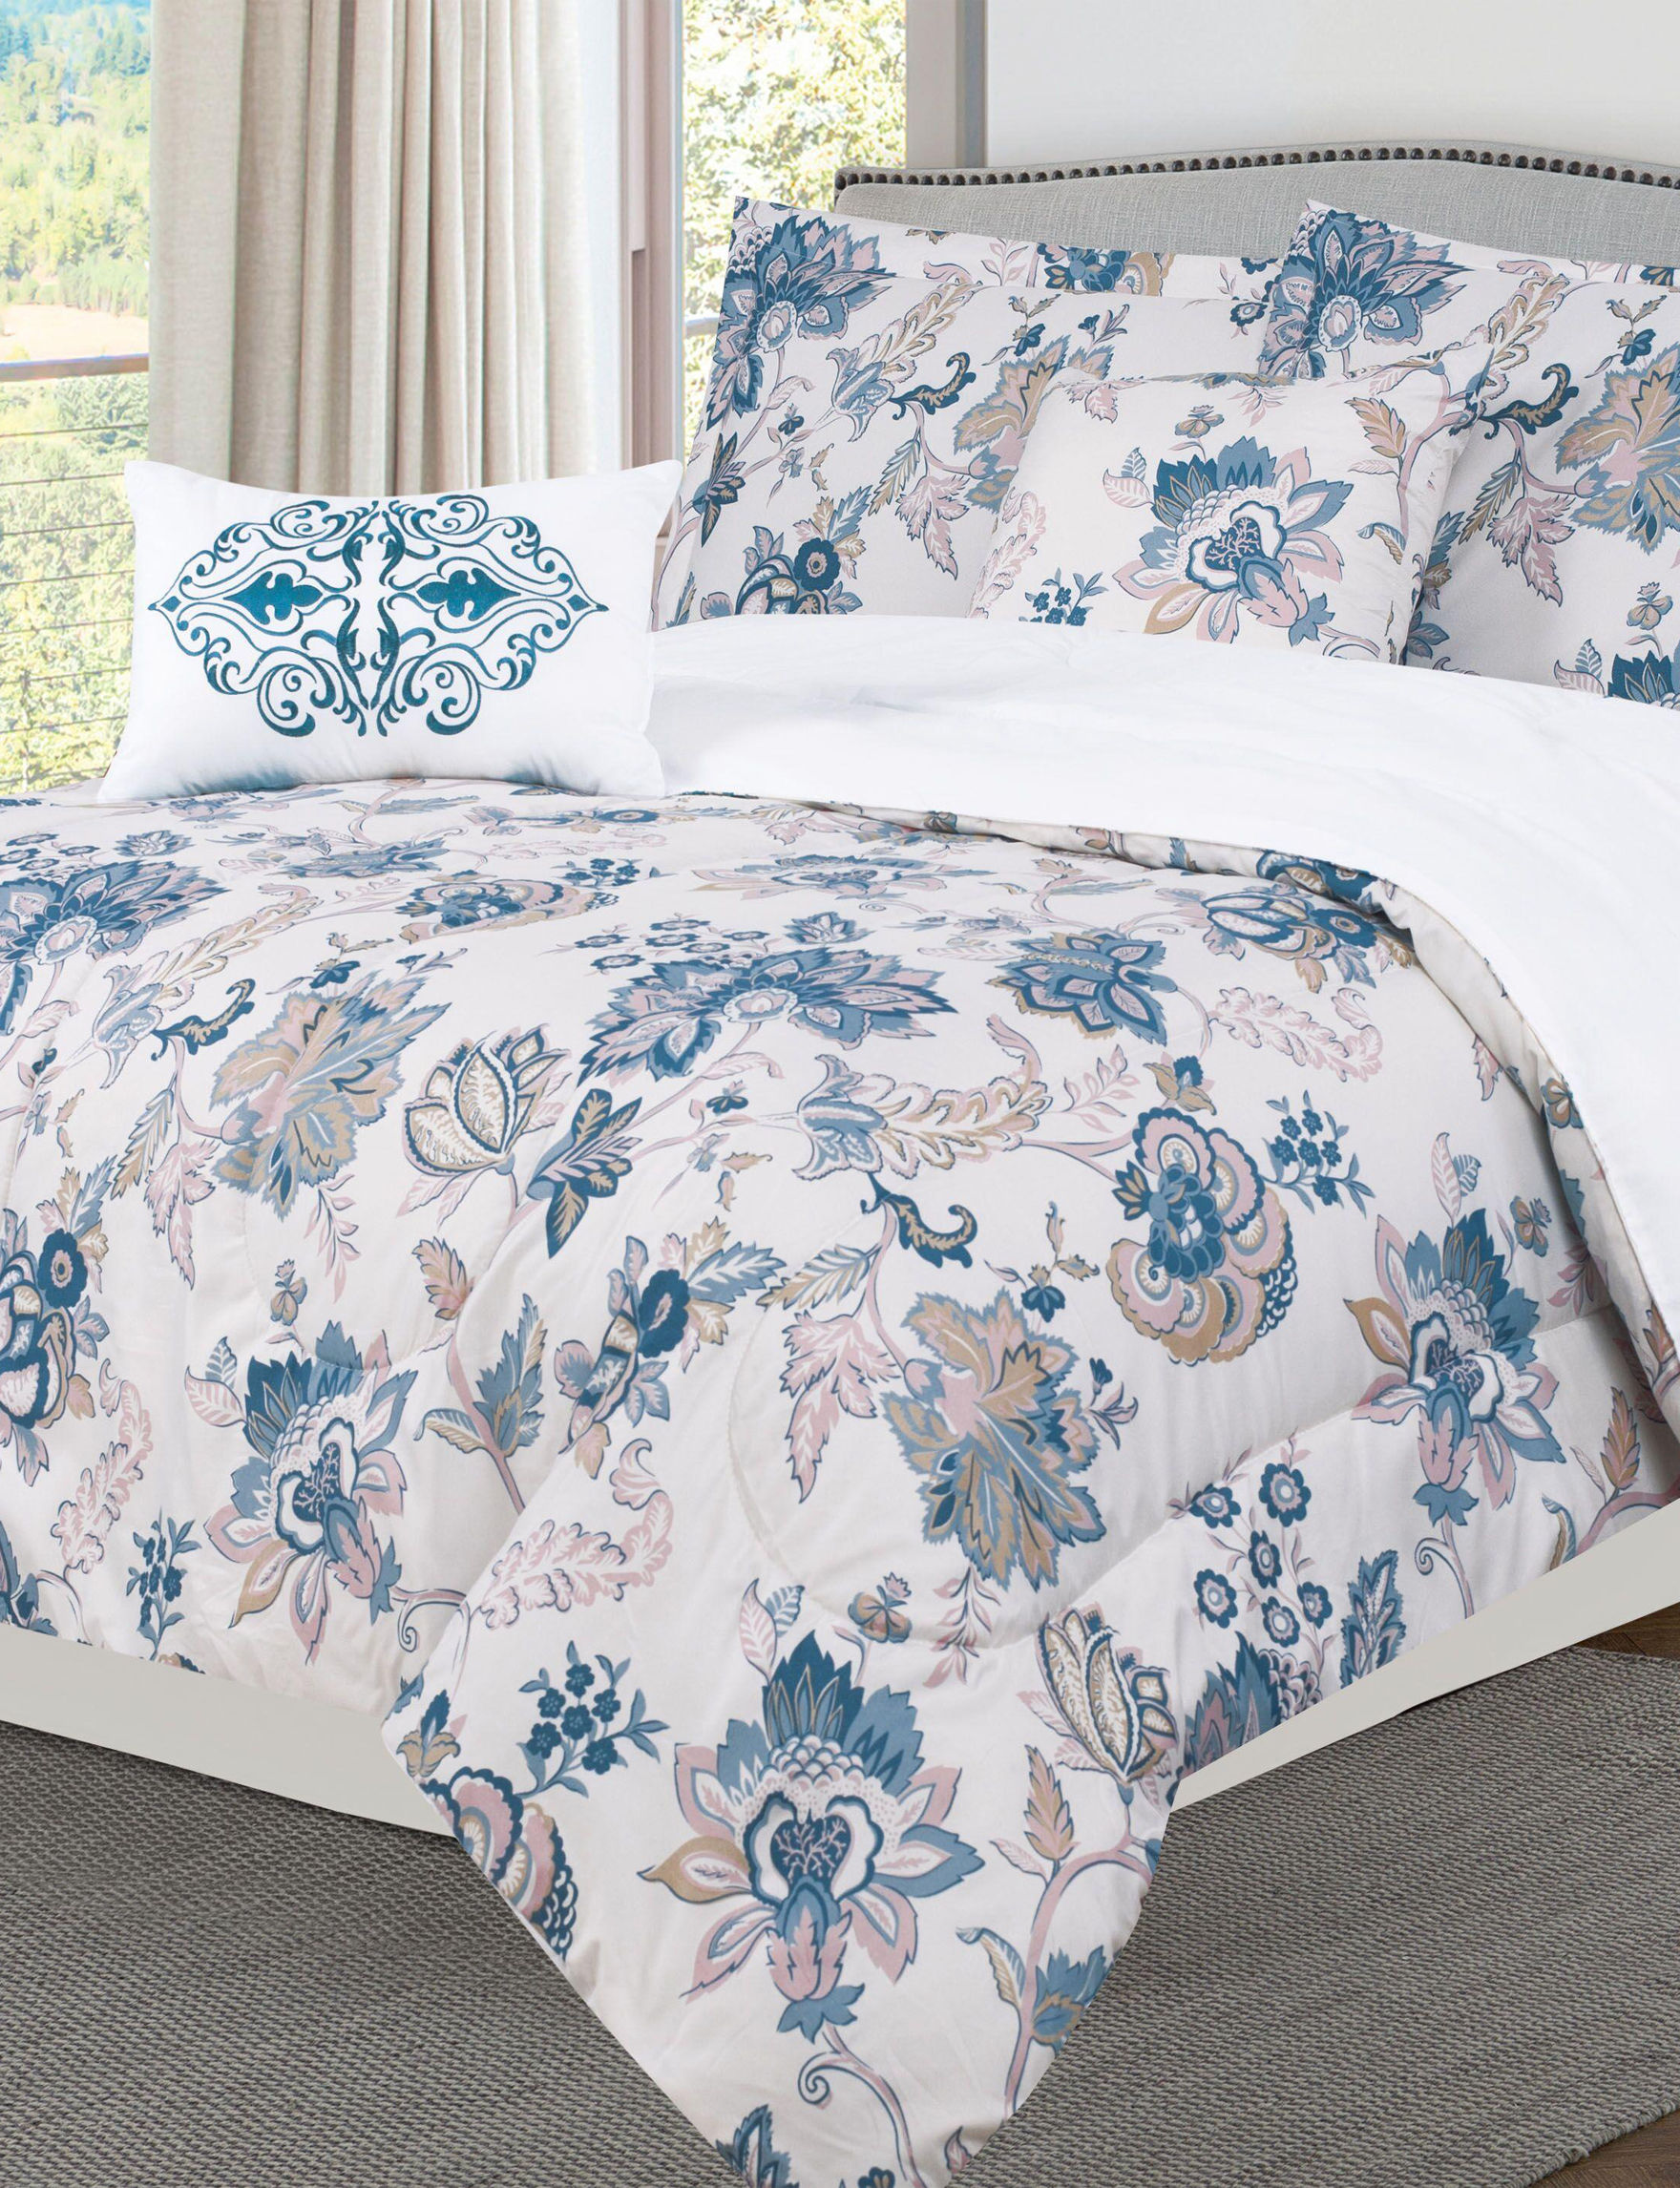 Bibbs Home White / Blue Comforters & Comforter Sets